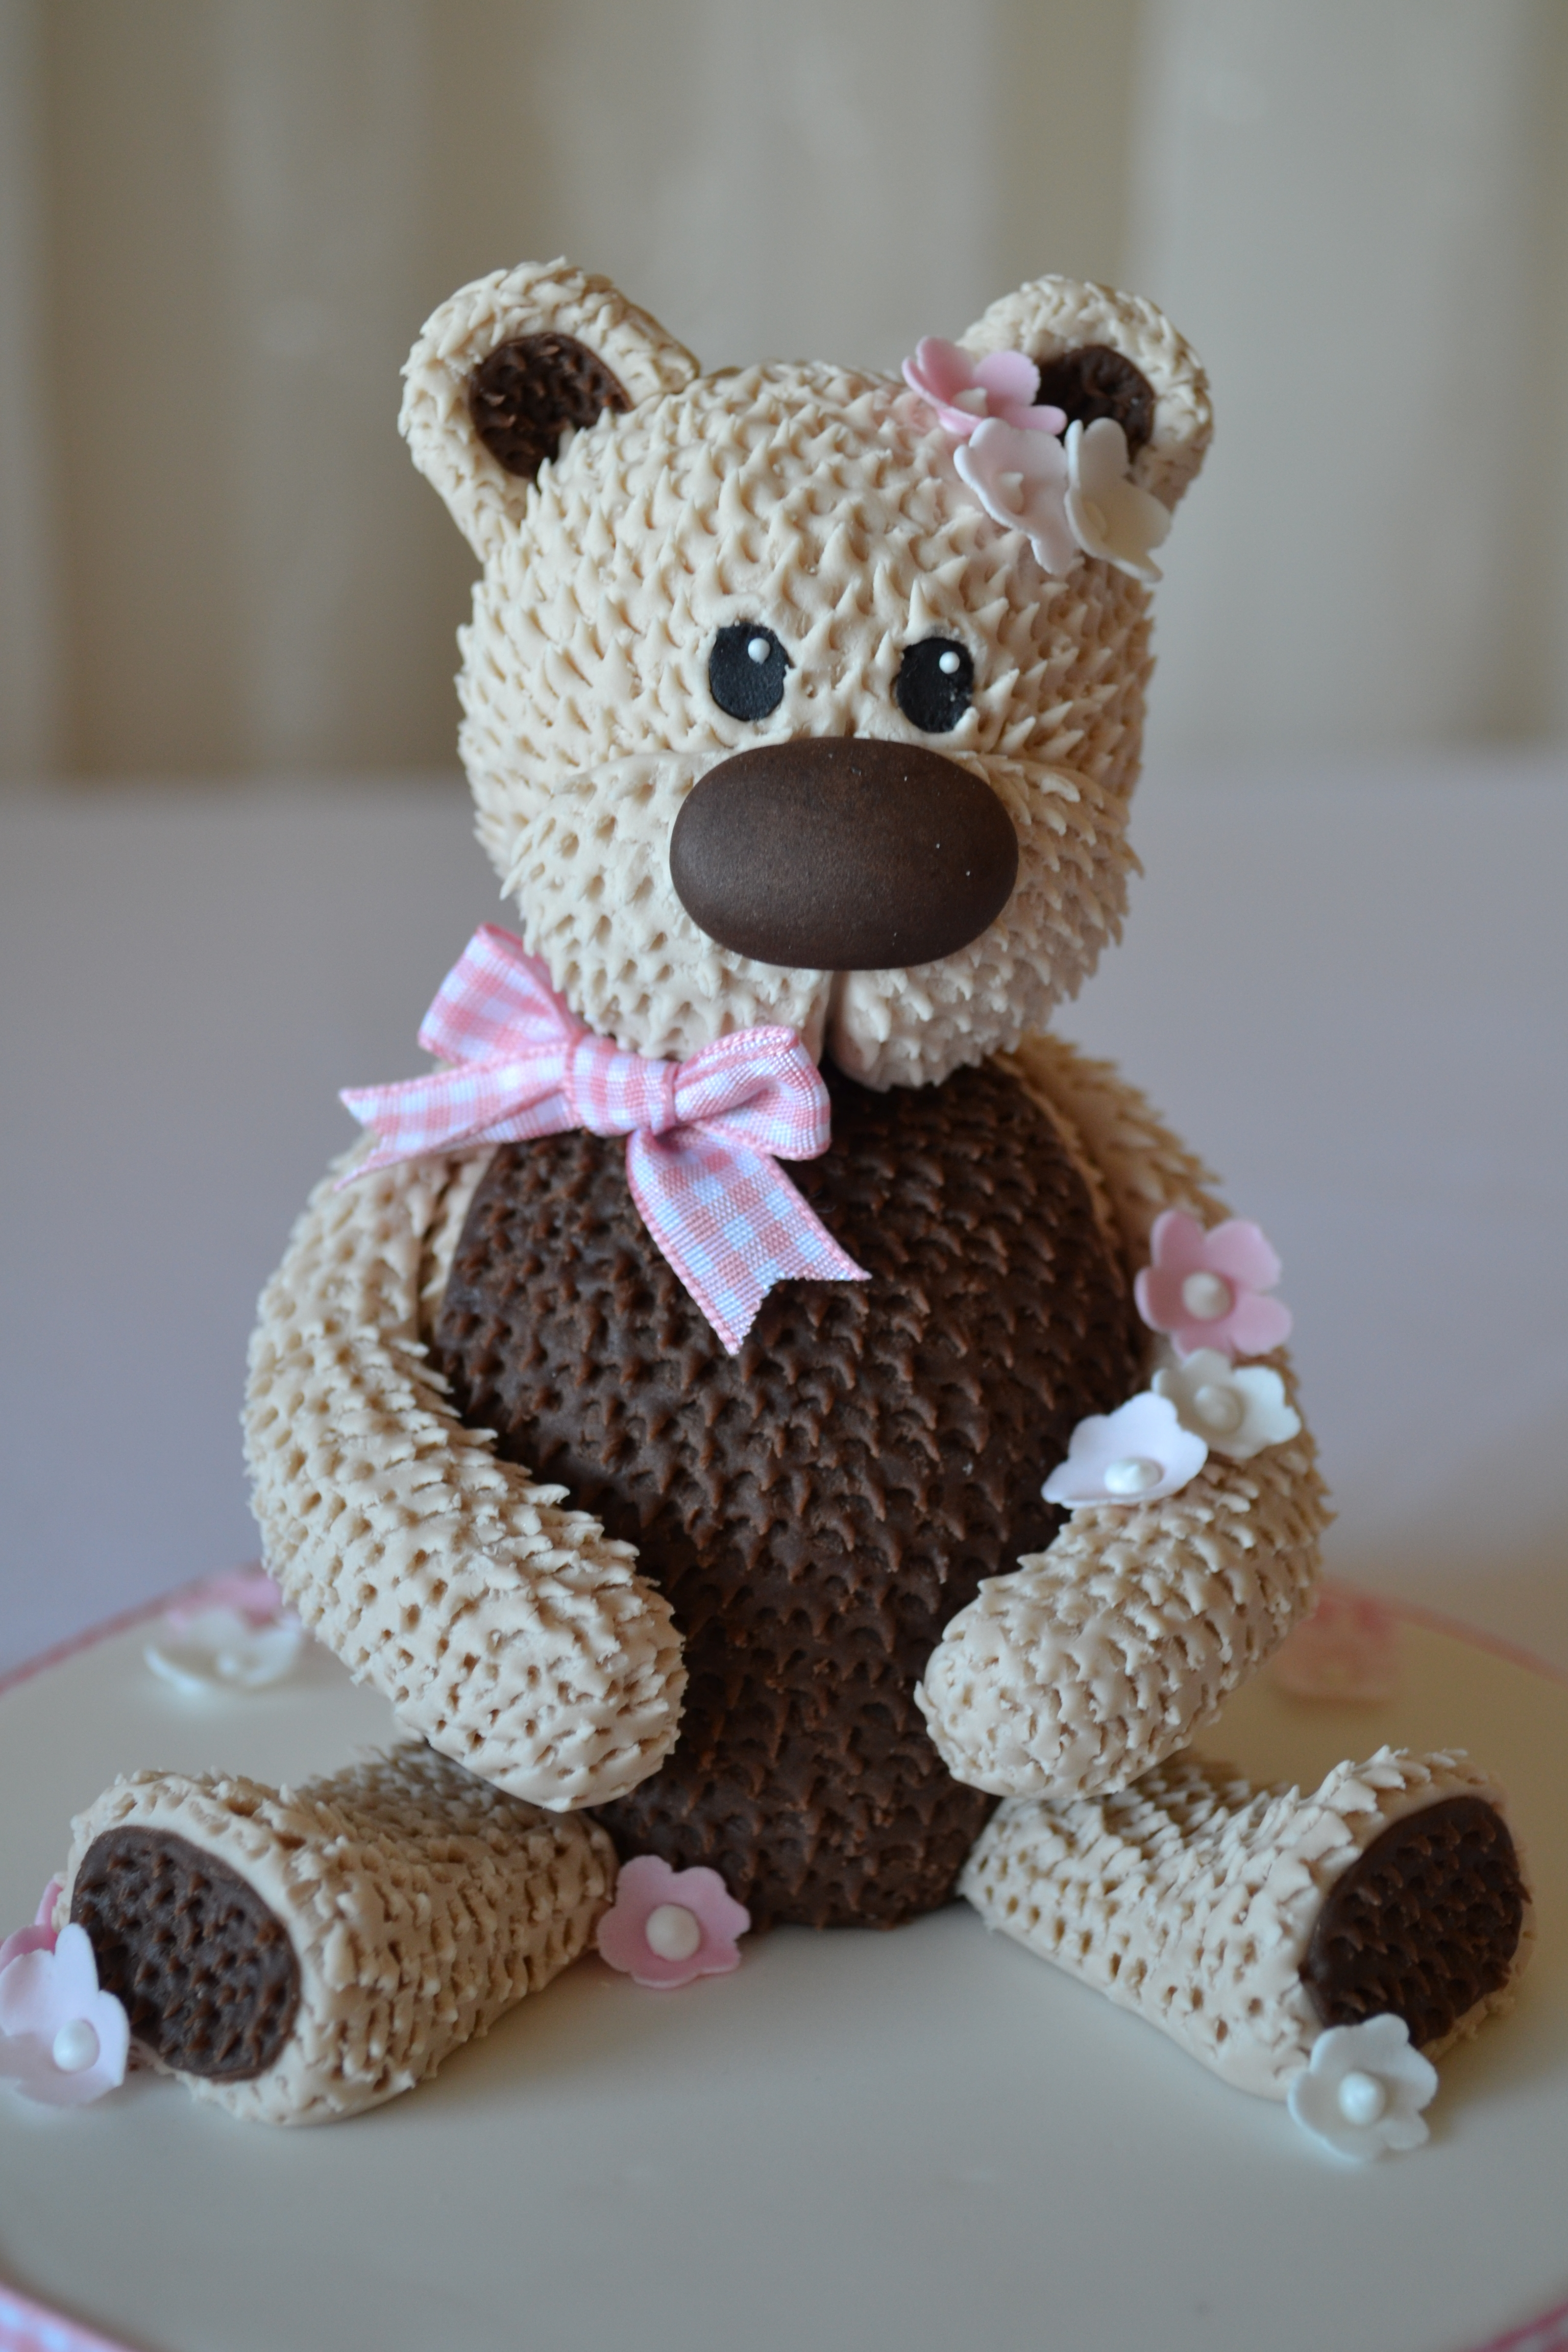 Cute Teddy Bear Cake Topper! - CakeCentral.com